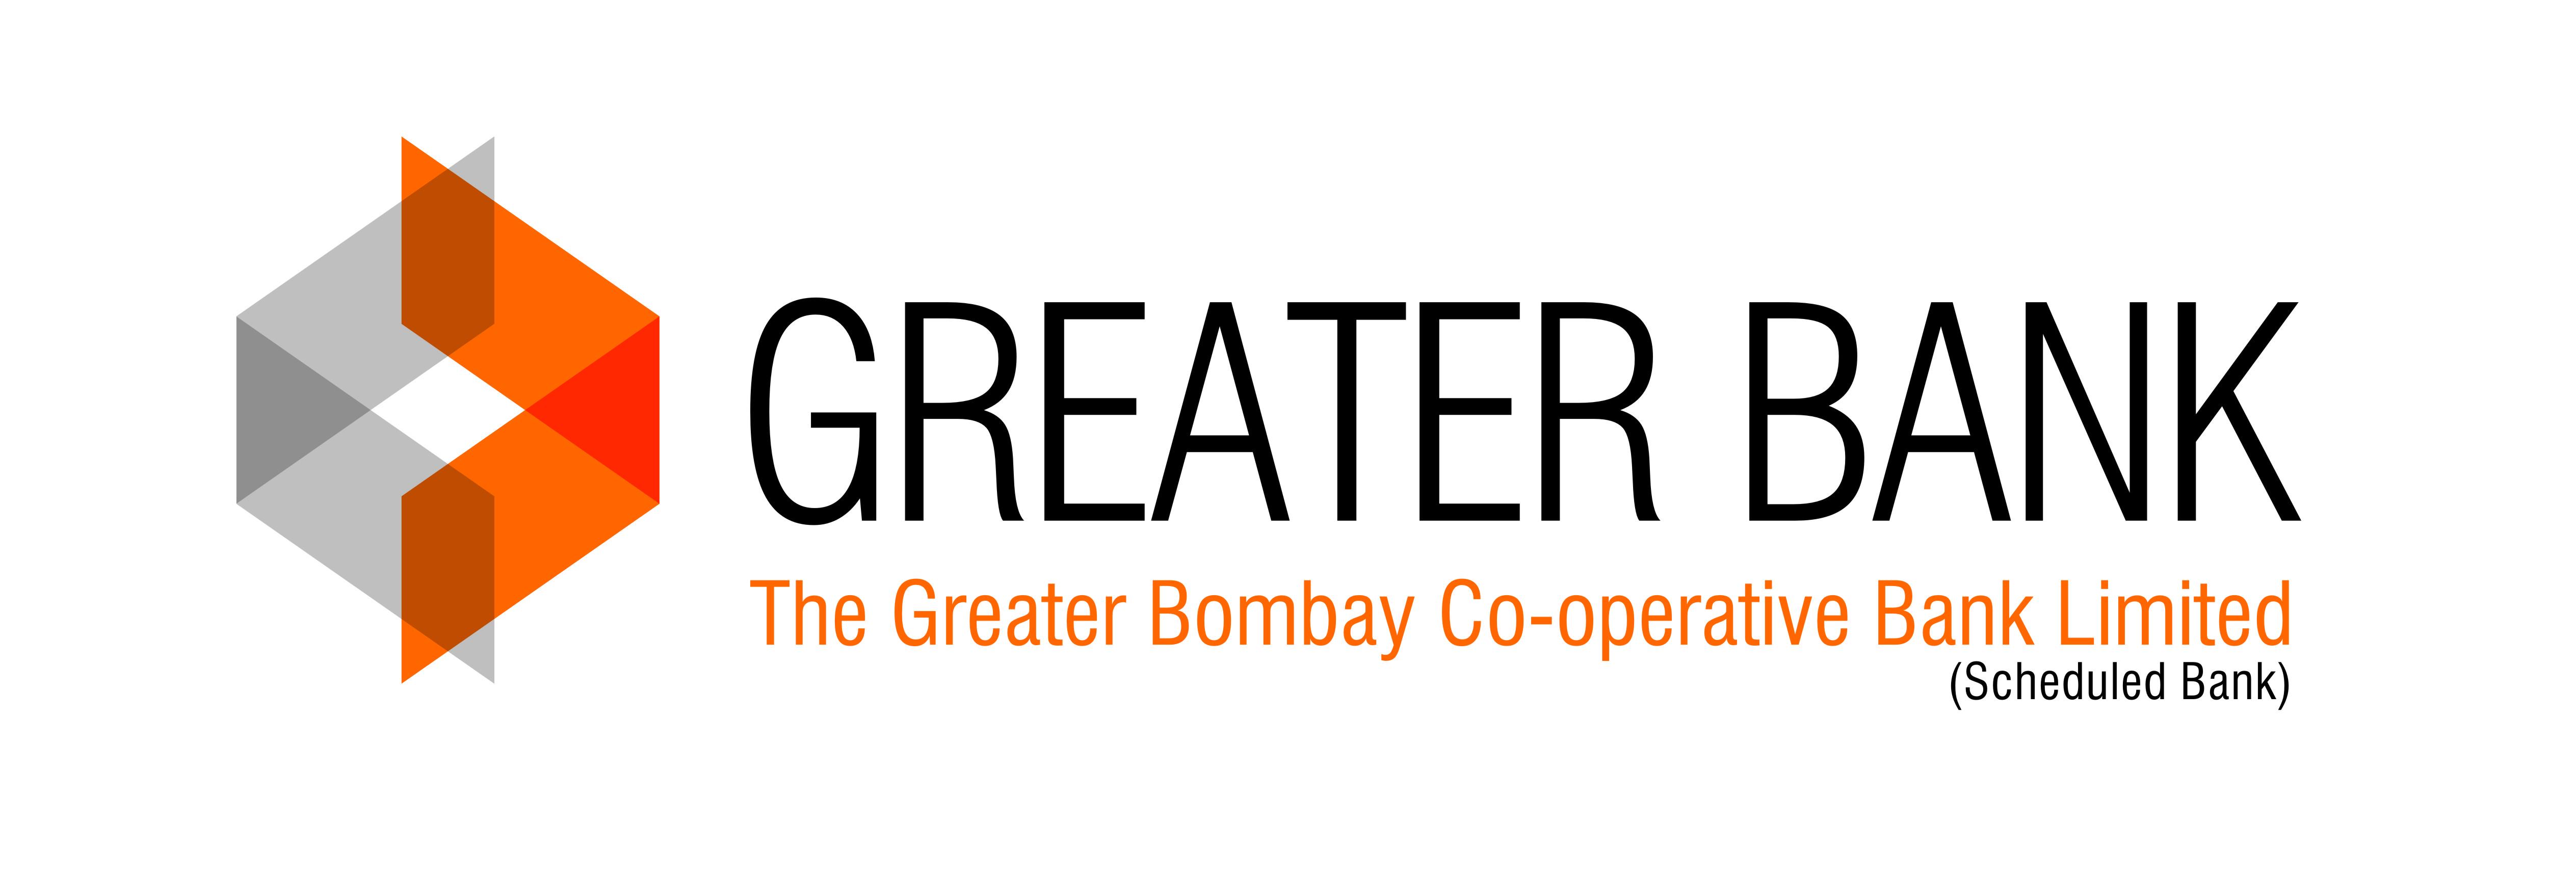 Check Greater Bombay Co-operative Bank ltd IFSC and MICR Codes Here @ Rupeenomics.com